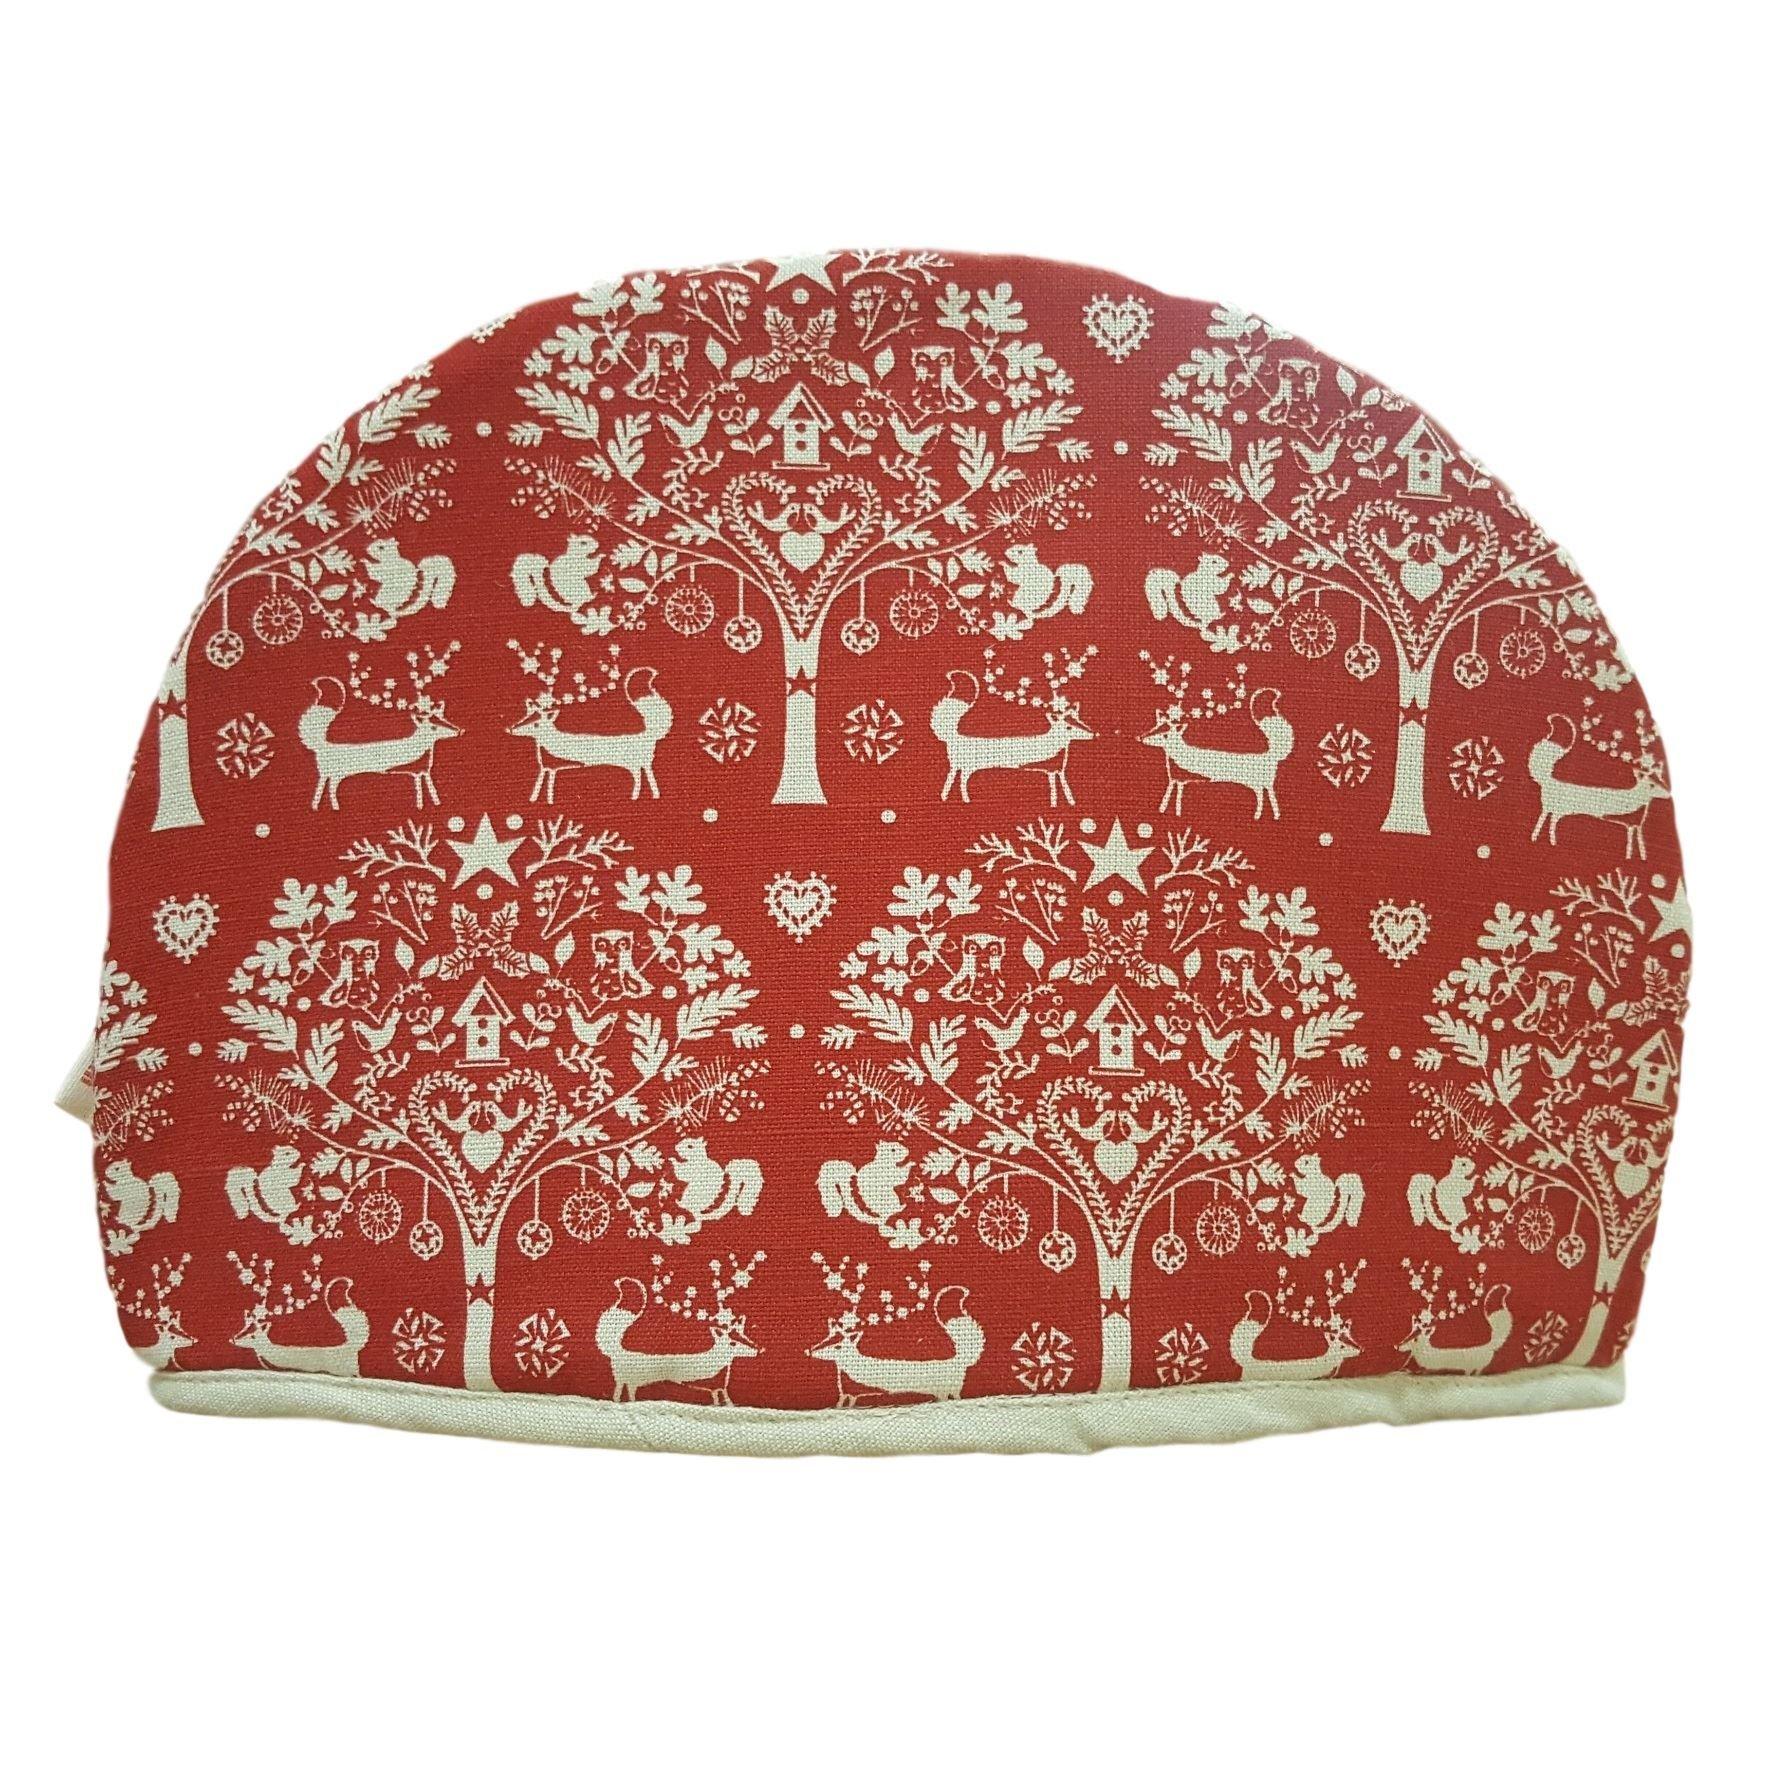 Dexam Tea Cozy Christmas Winter Woodland Design Red Folk Style